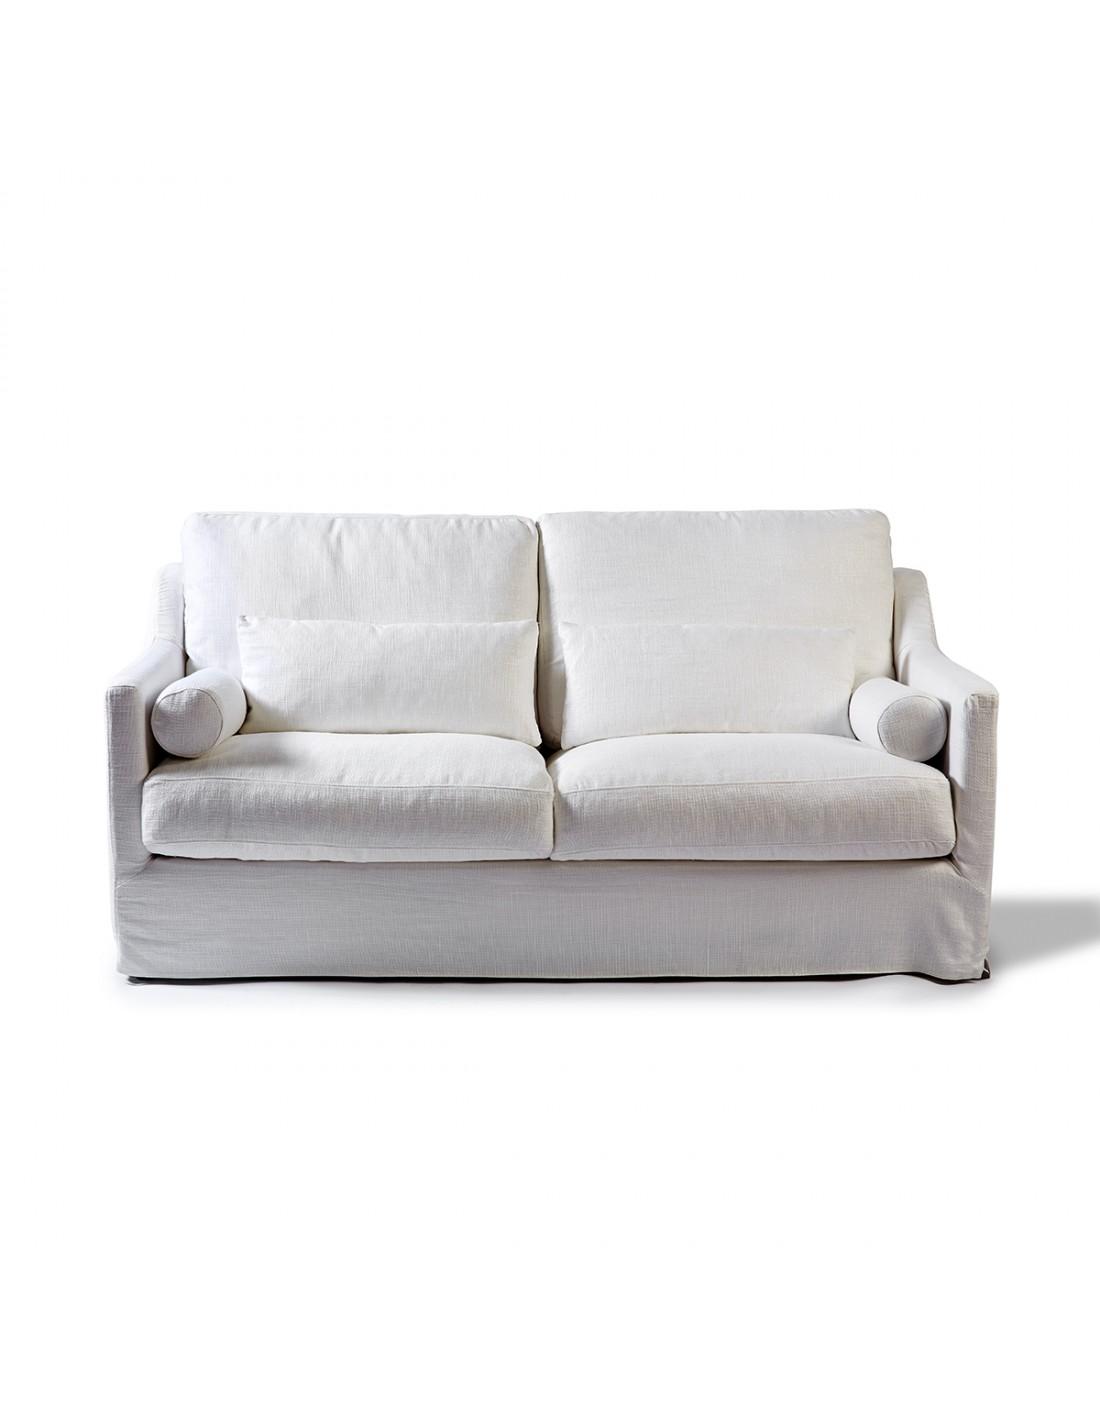 Sofa de dos plazas blanco roto - Sofas de dos plazas ...